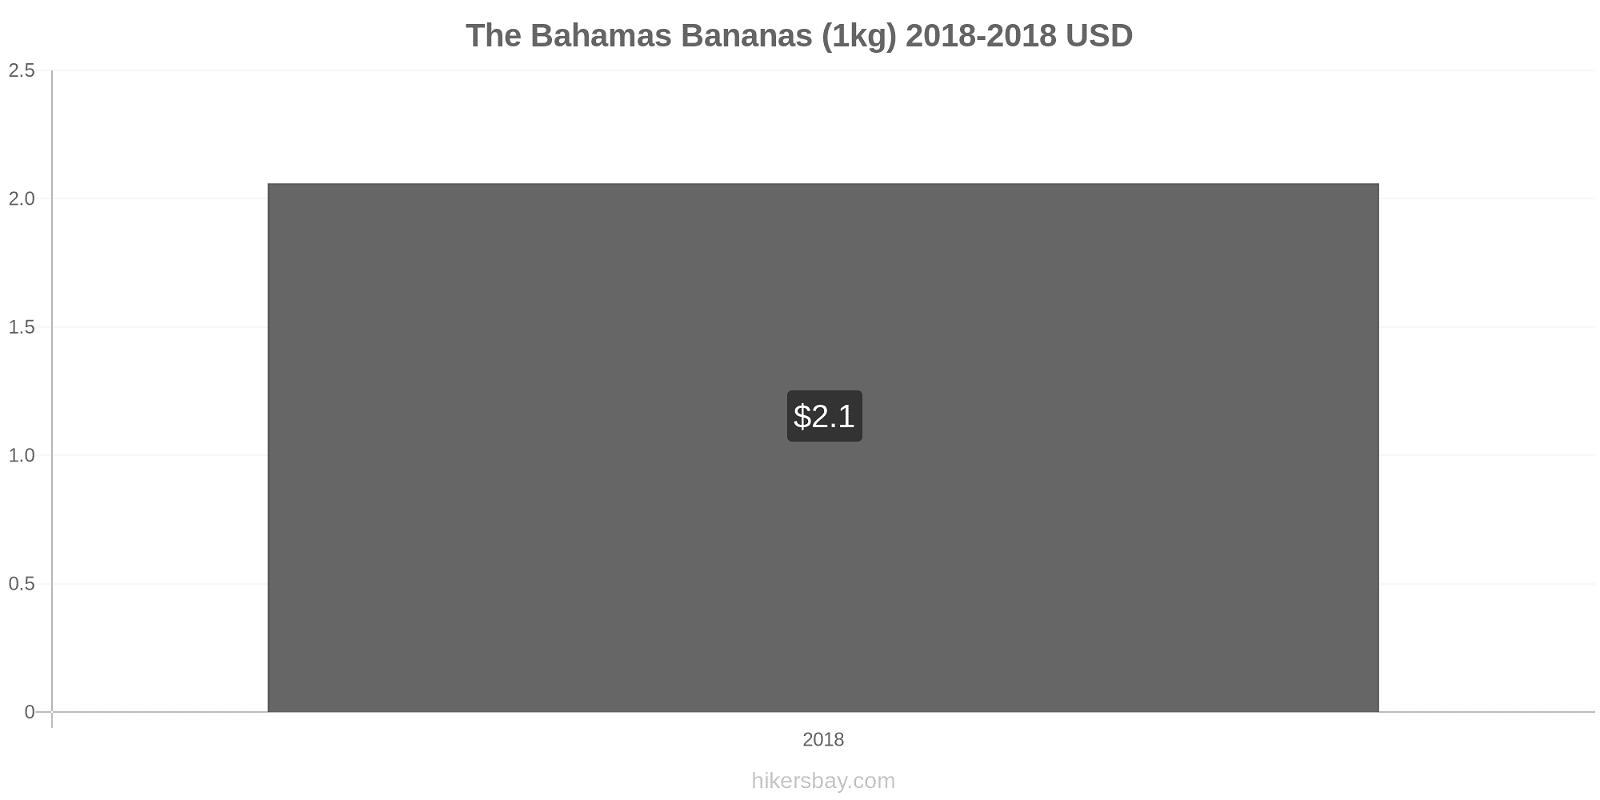 The Bahamas price changes Bananas (1kg) hikersbay.com